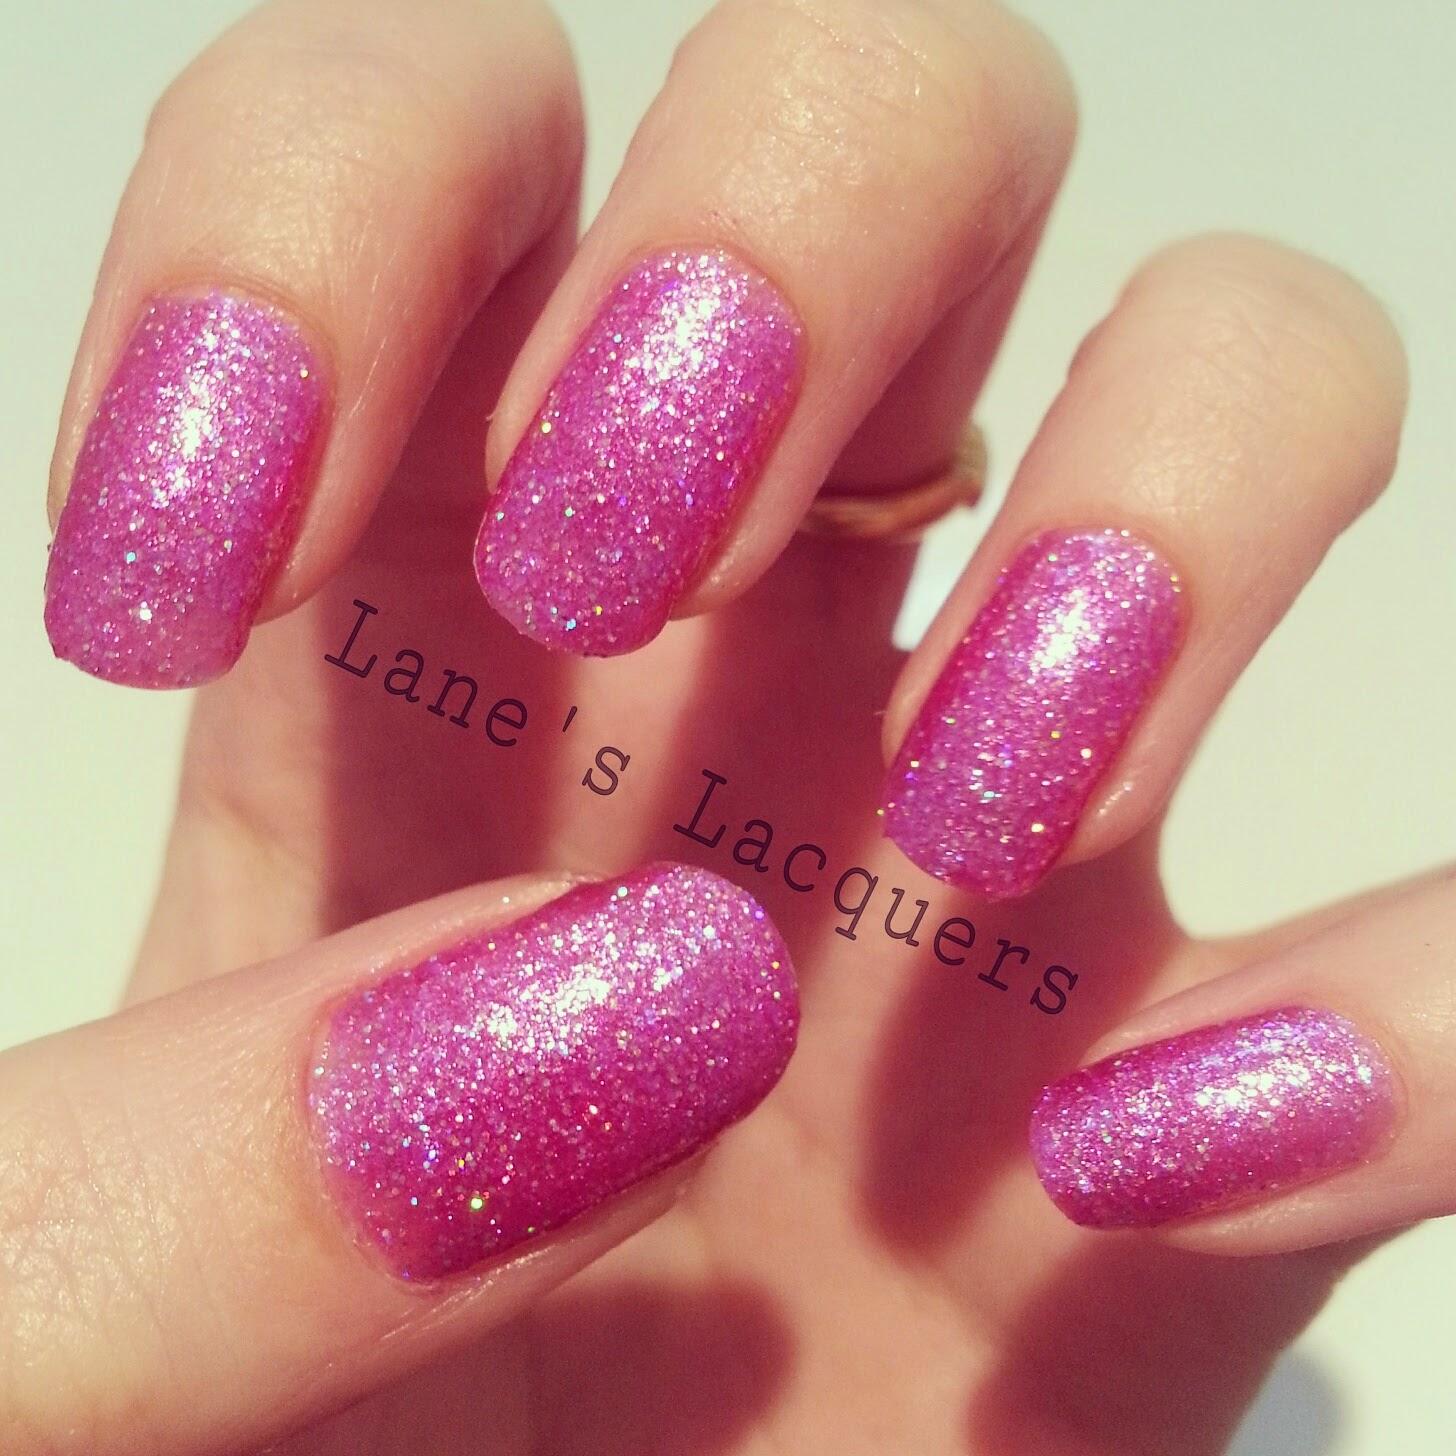 new-barry-m-glitterati-socialite-swatch-manicure